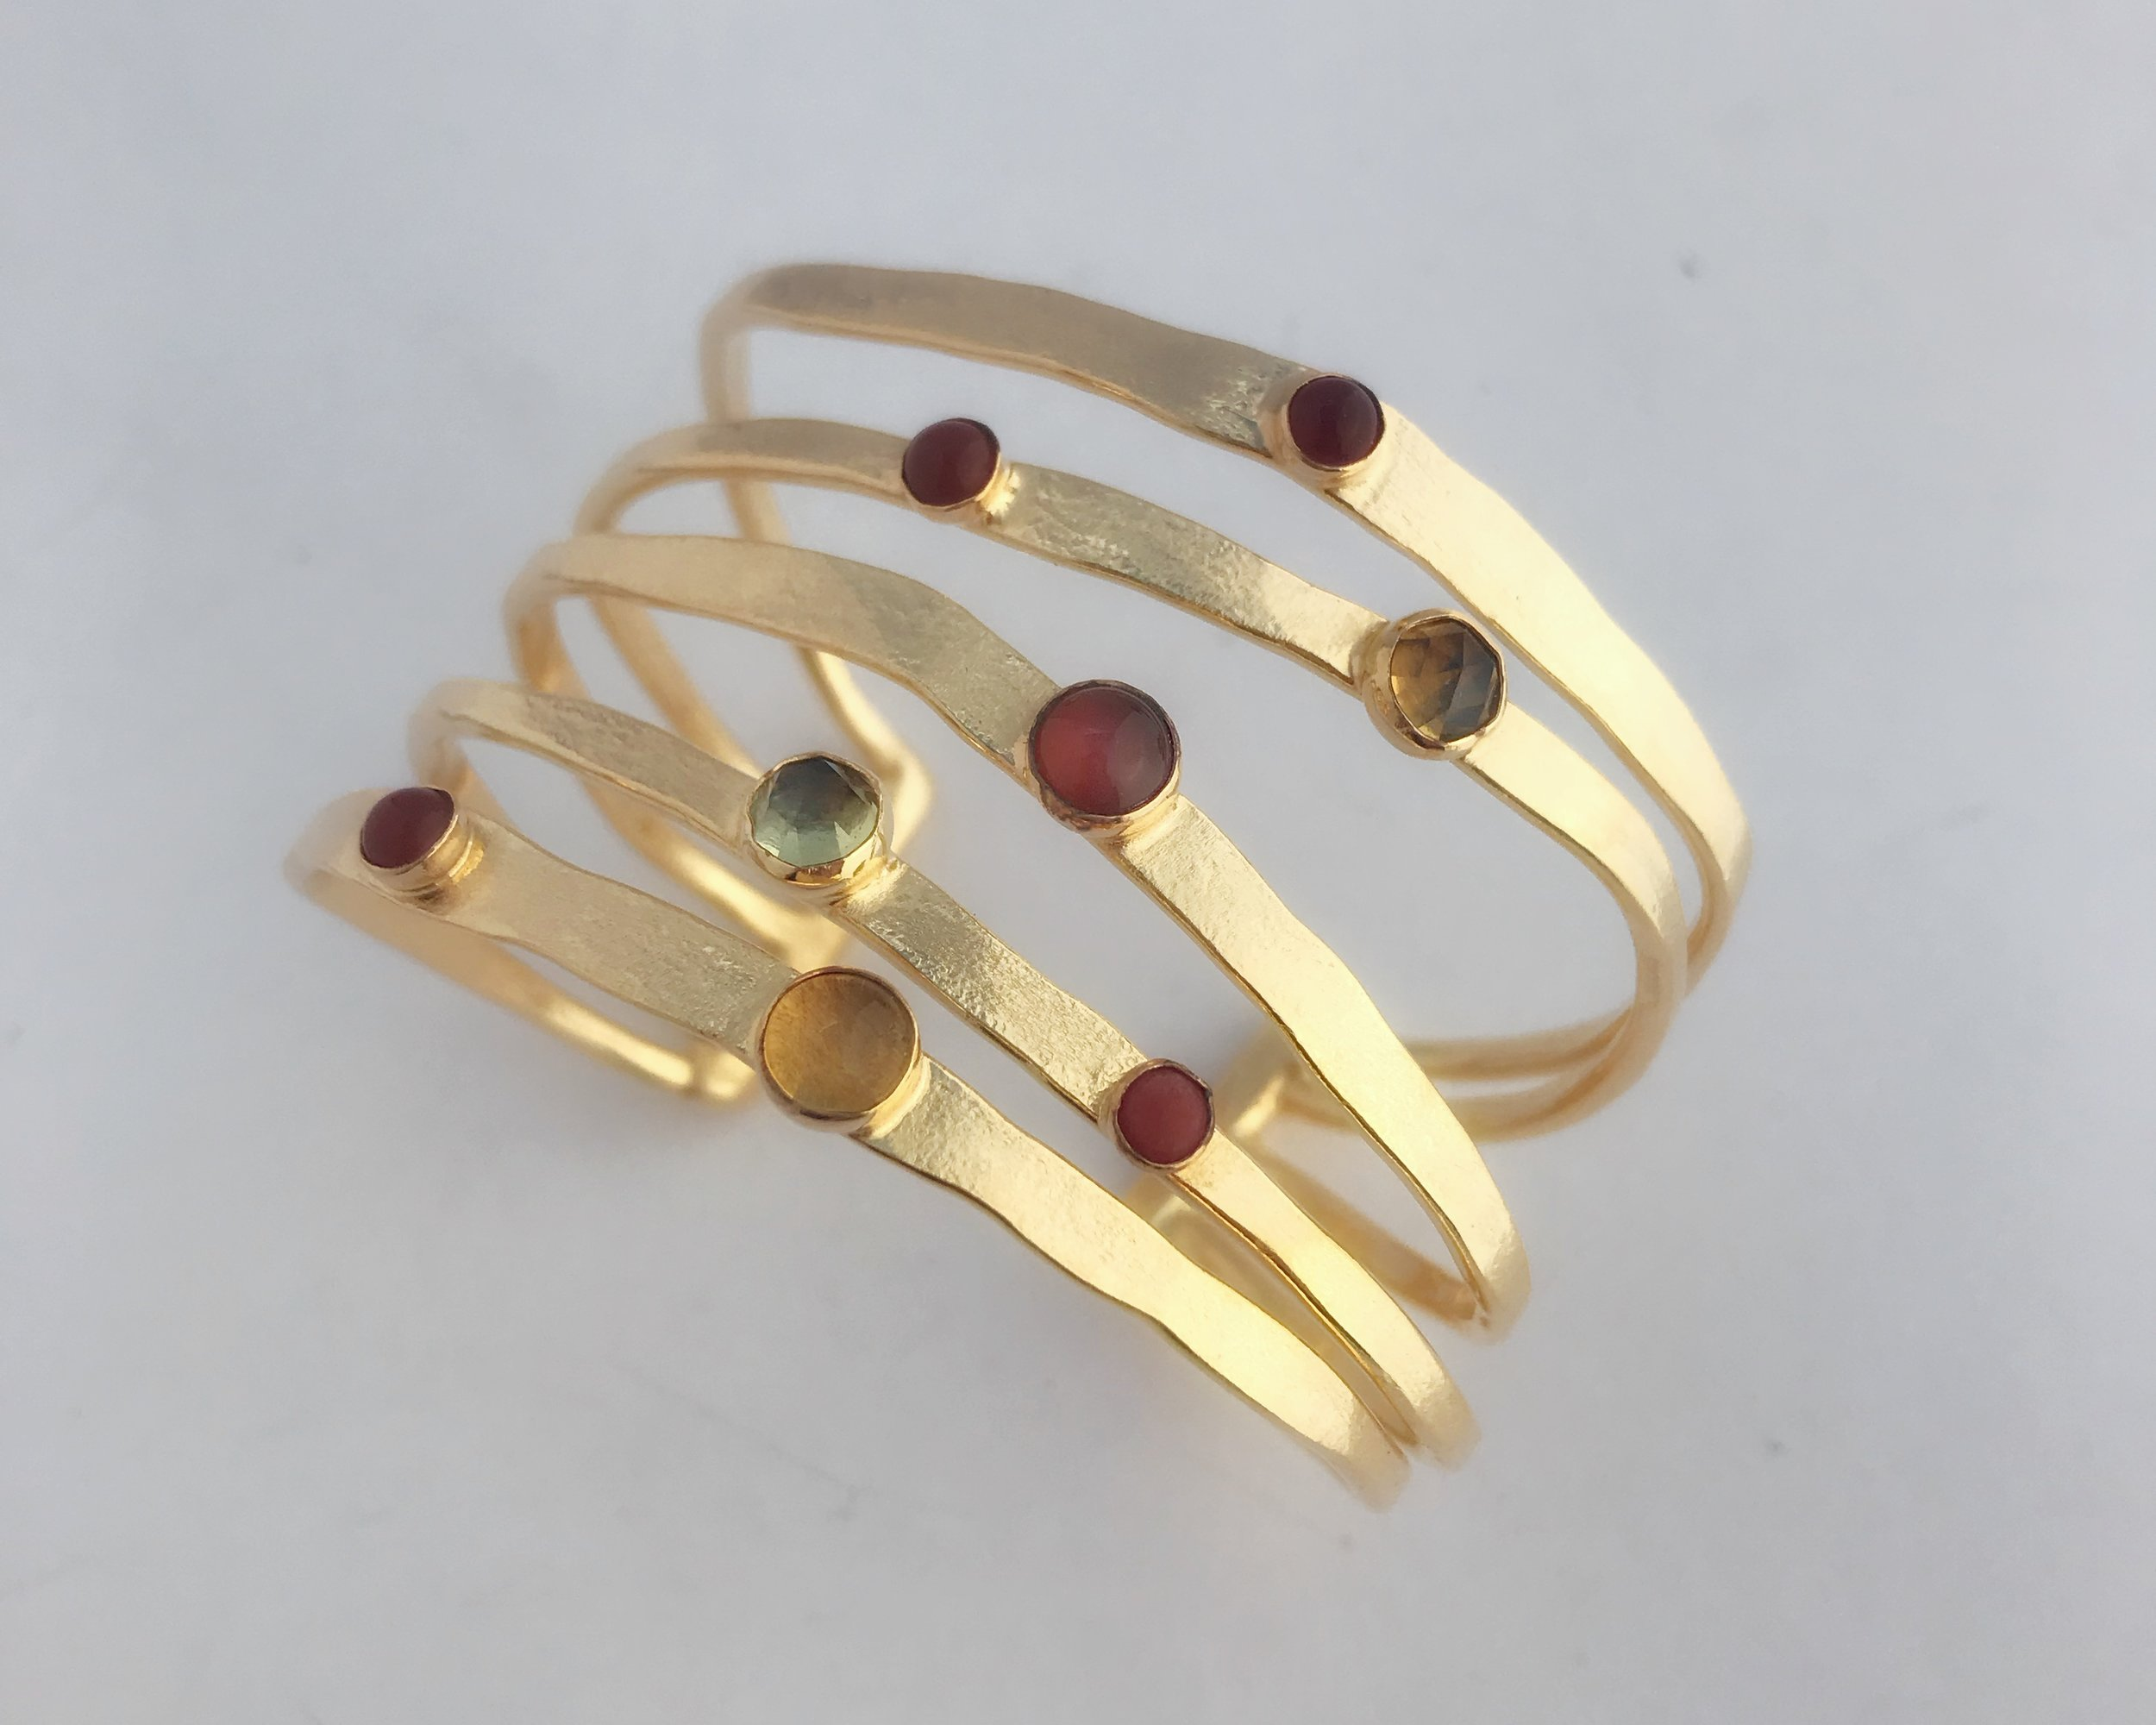 Five Cage Bracelet, Gold Plate, Semi Precious Mixed Earth Tone Stones